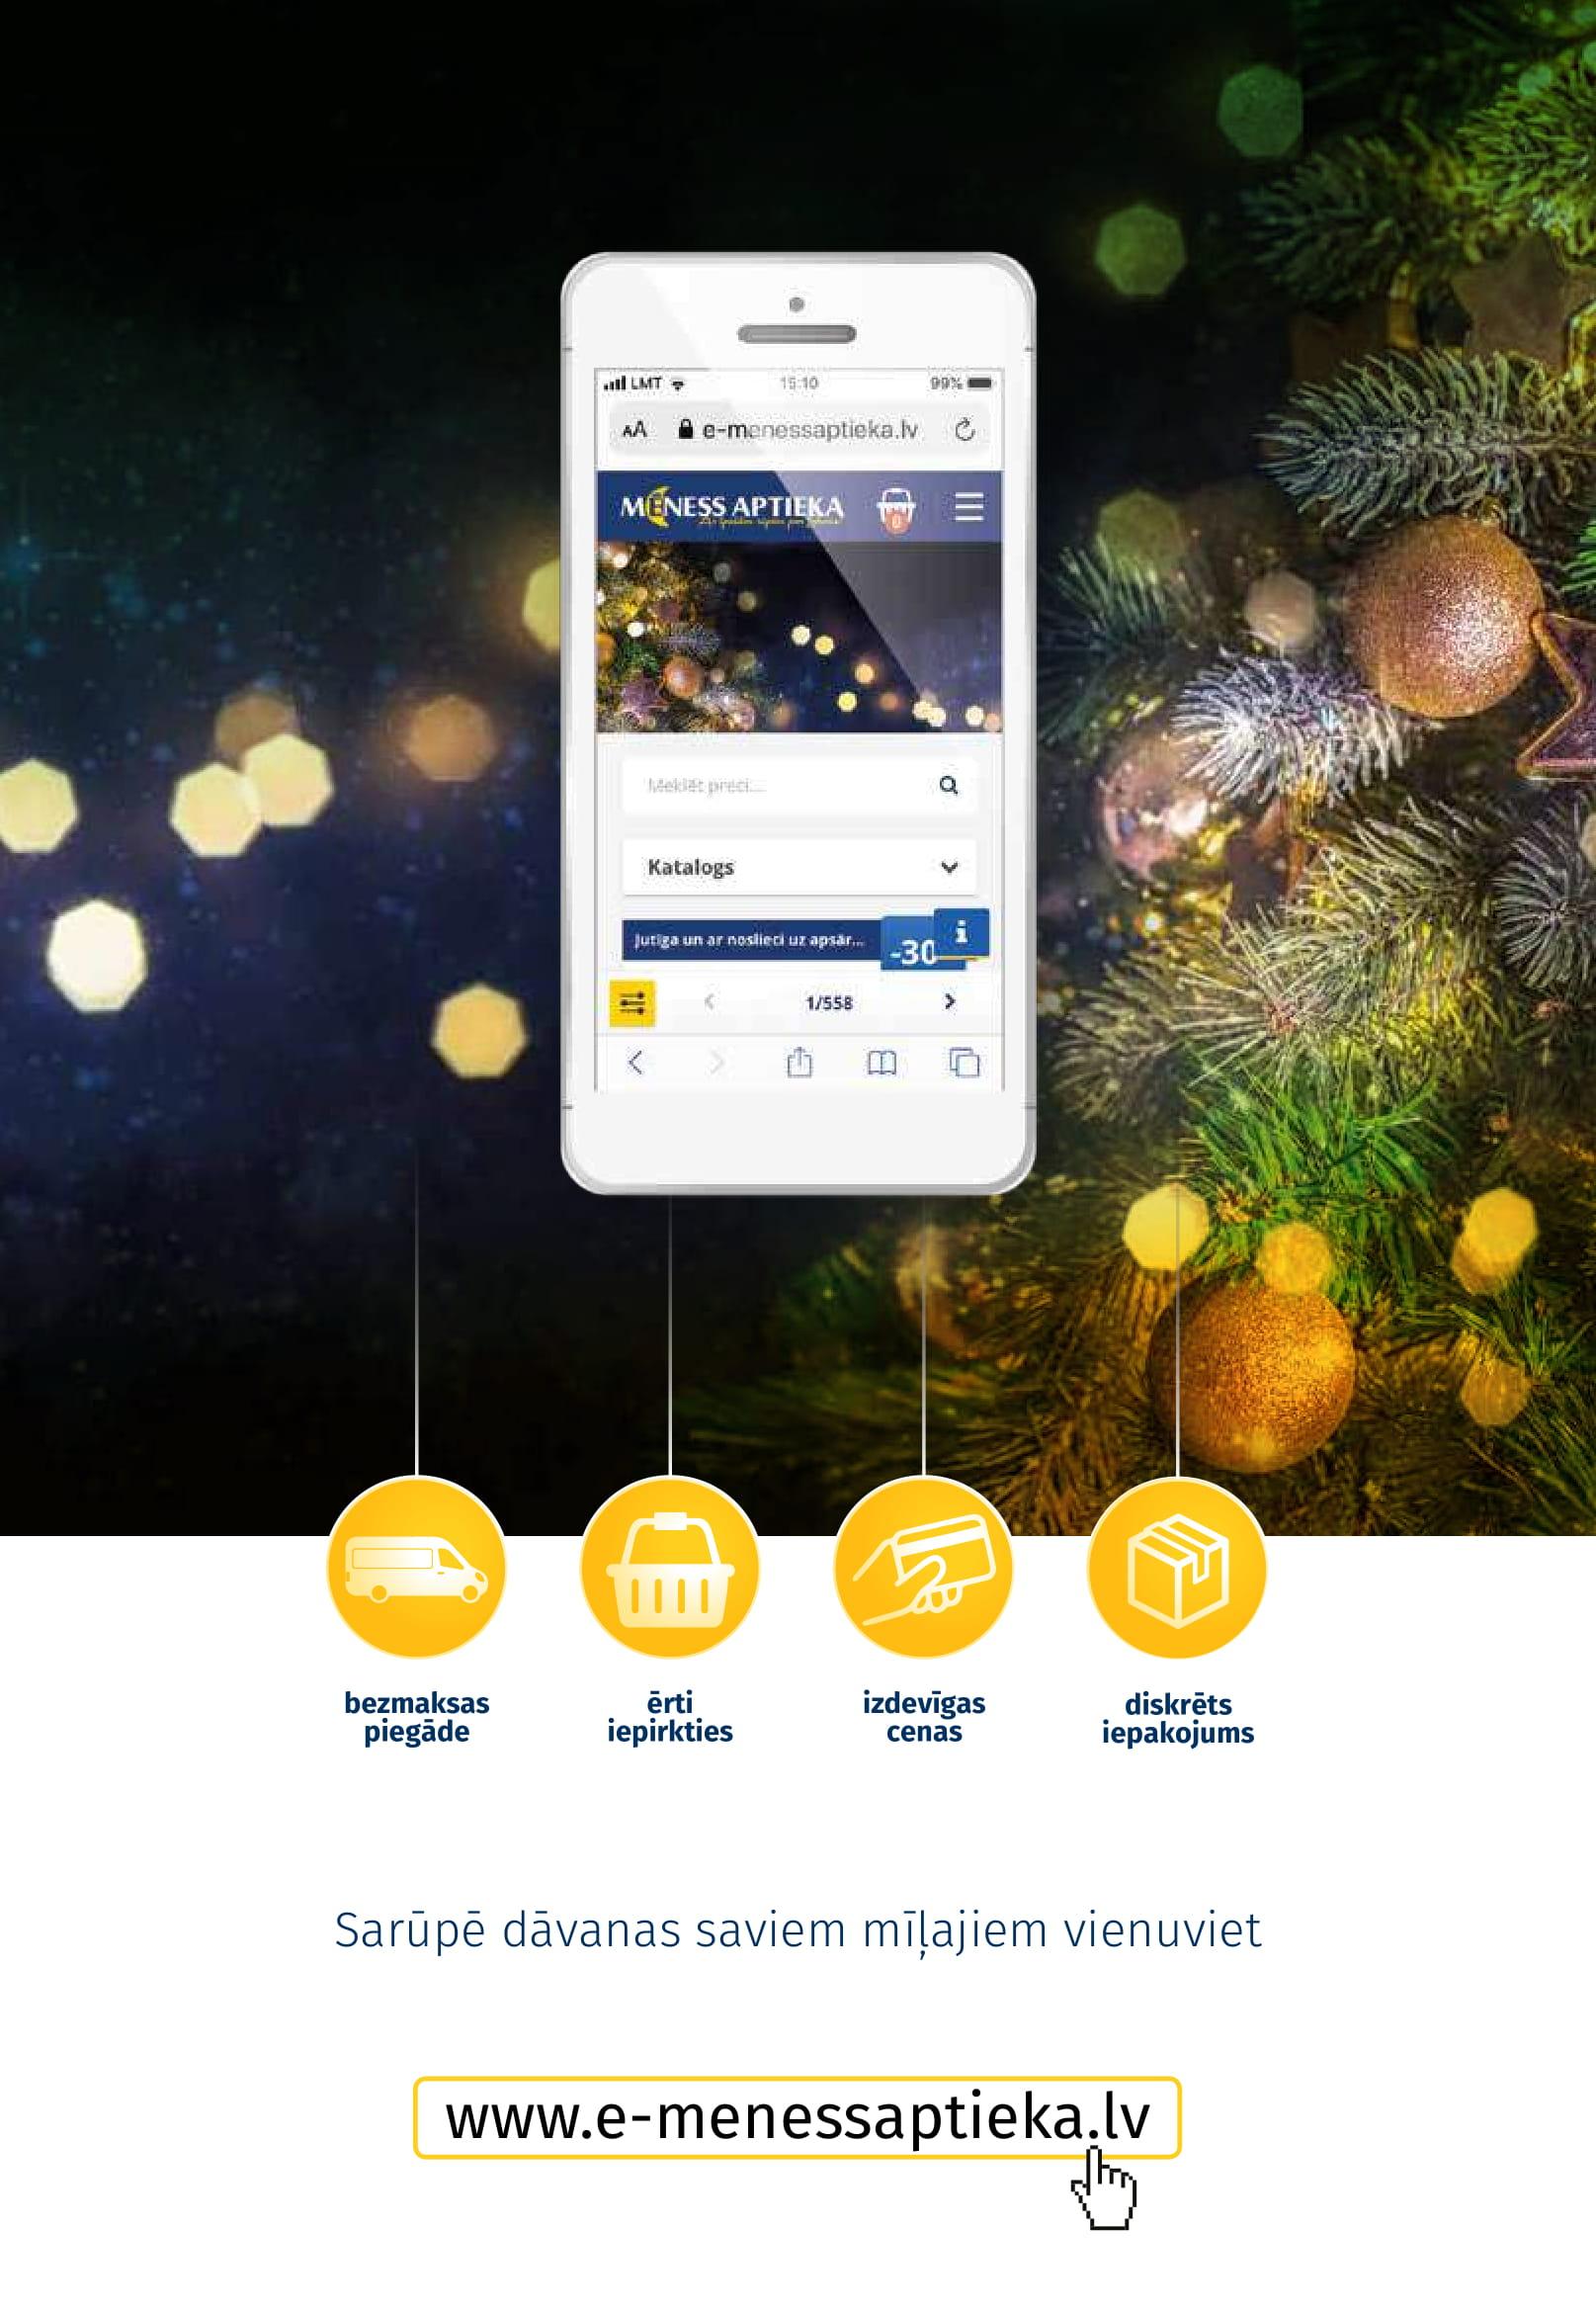 MĒNESS APTIEKA akcijas buklets 01.12.2019 - 31.12.2019